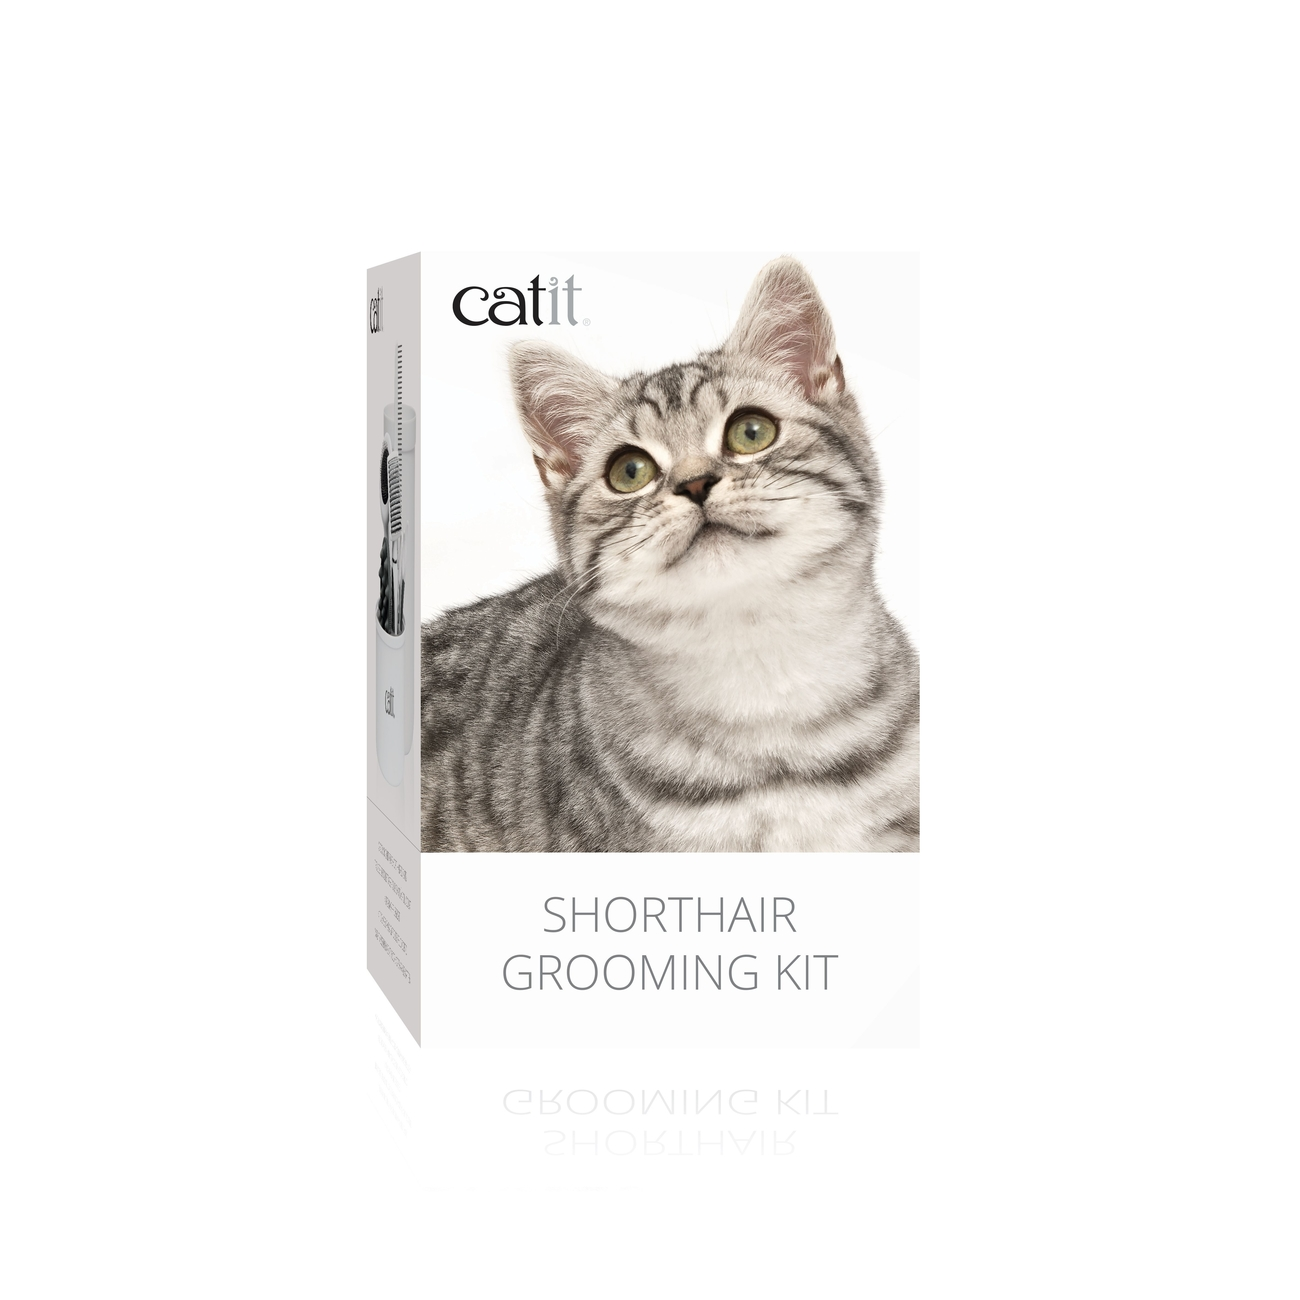 Catit Grooming Kit - Bürsten-Set für Katzen, Bild 2